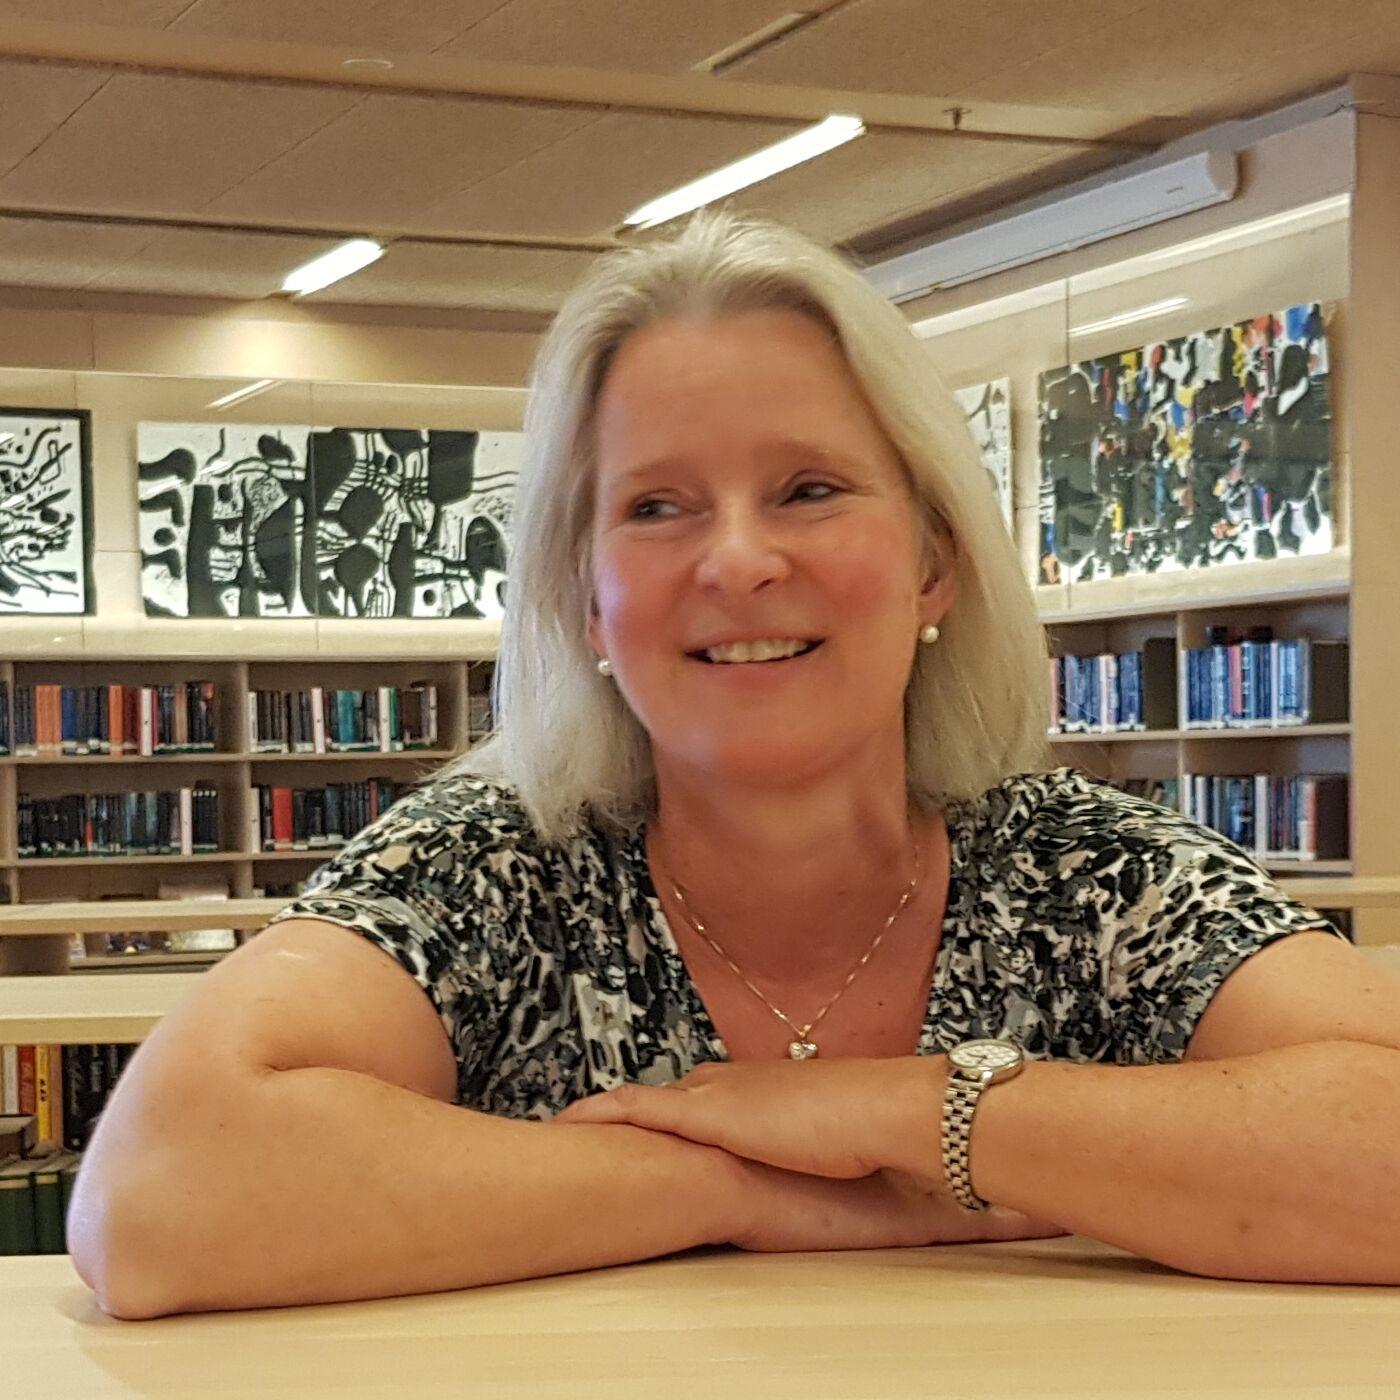 Spirapodden: Bienes historie/ Nina Simoneprosjekt i  Flekkefjord jazzklubb/Flekkefjord bibliotek